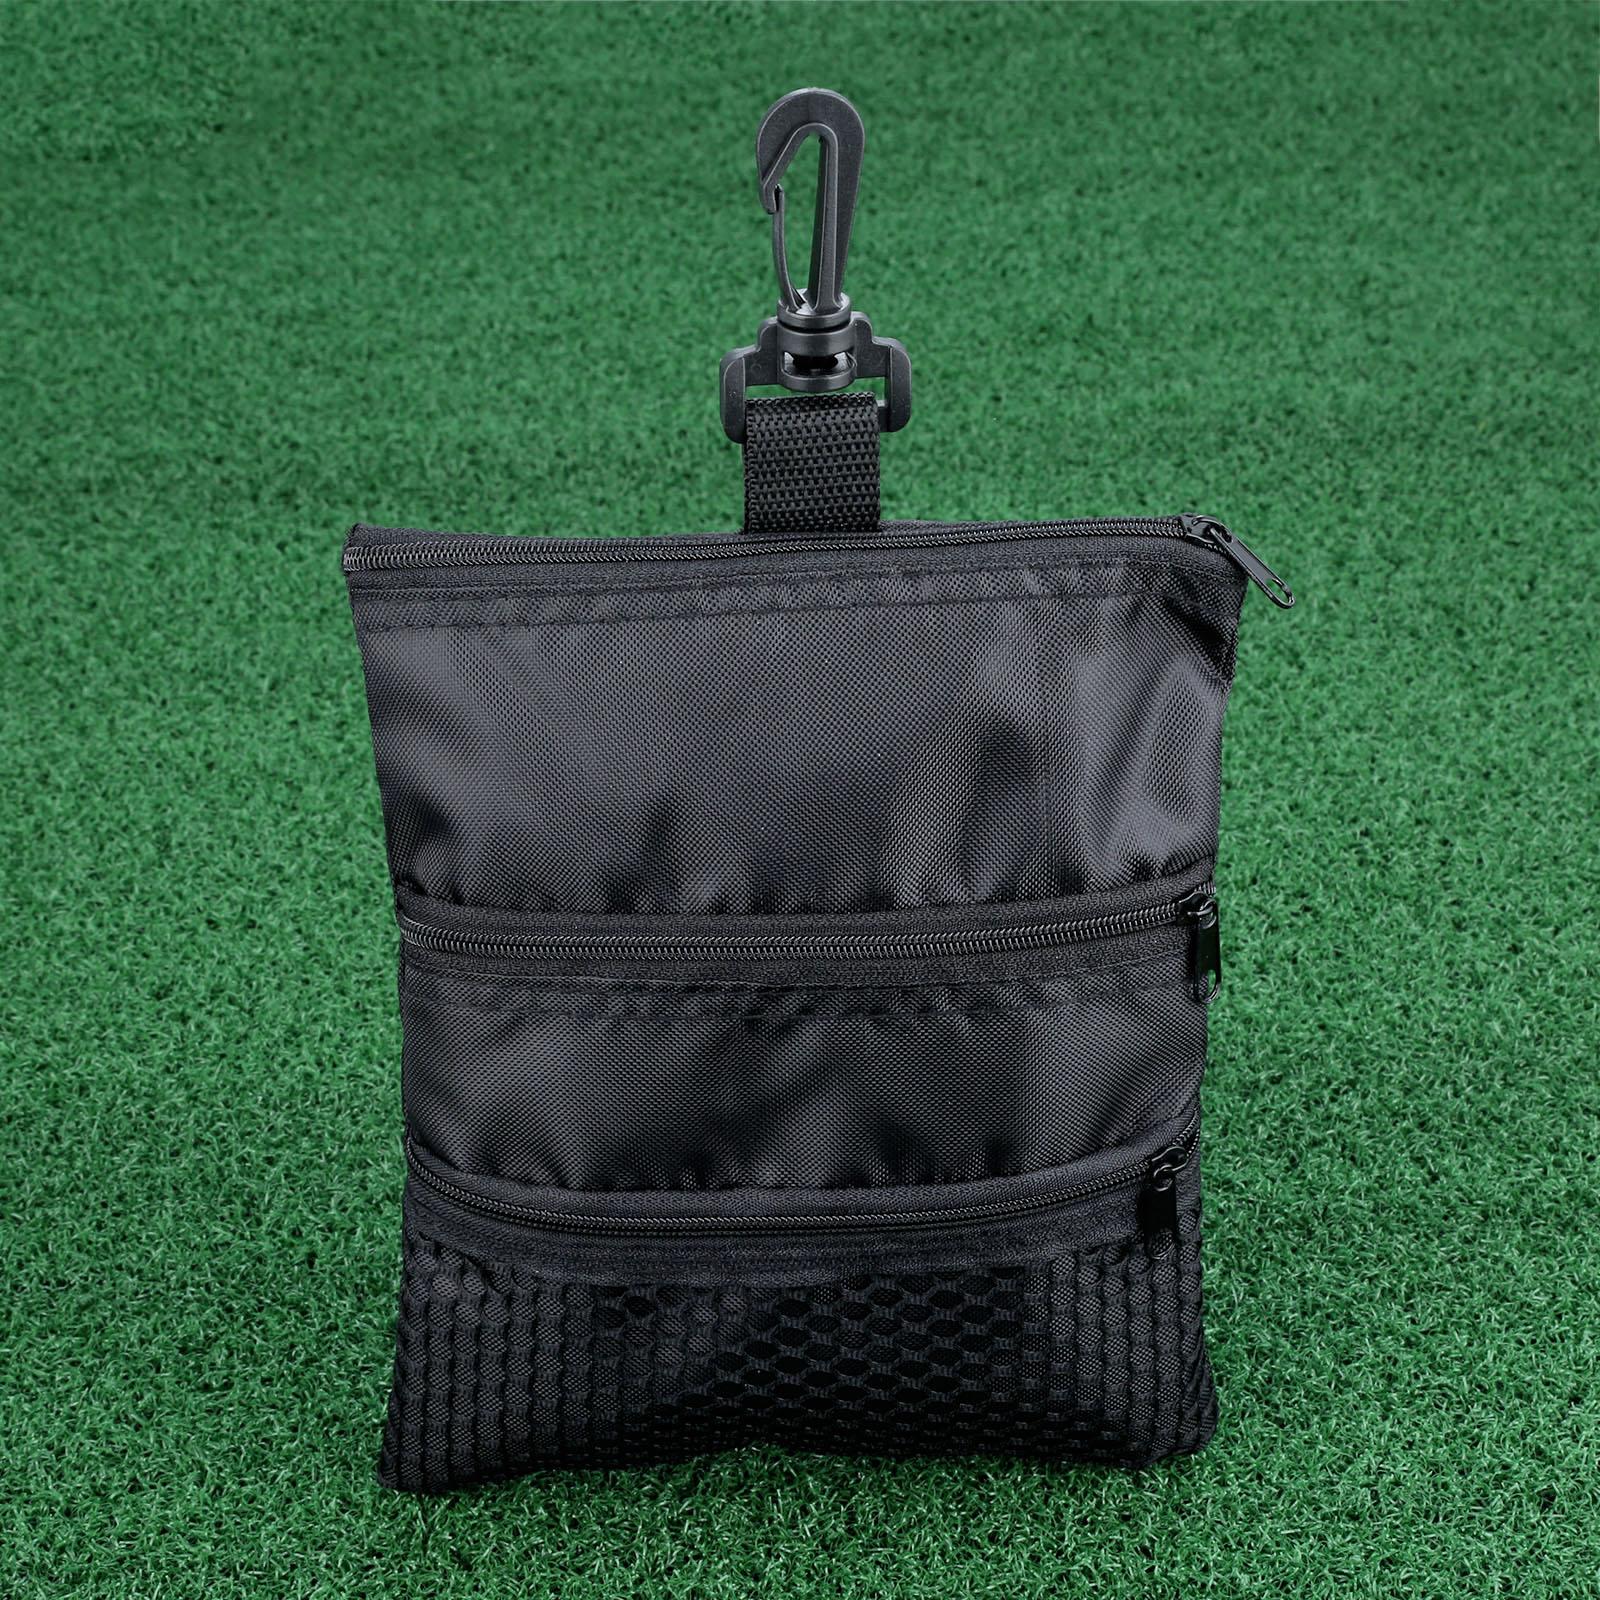 Canvas 1 Pc Mesh Mini Golf Ball Bag Pouch Golf Tees Holder Multi-Pocket Zipper Handbag Bag Storage Case Training Practice Tool